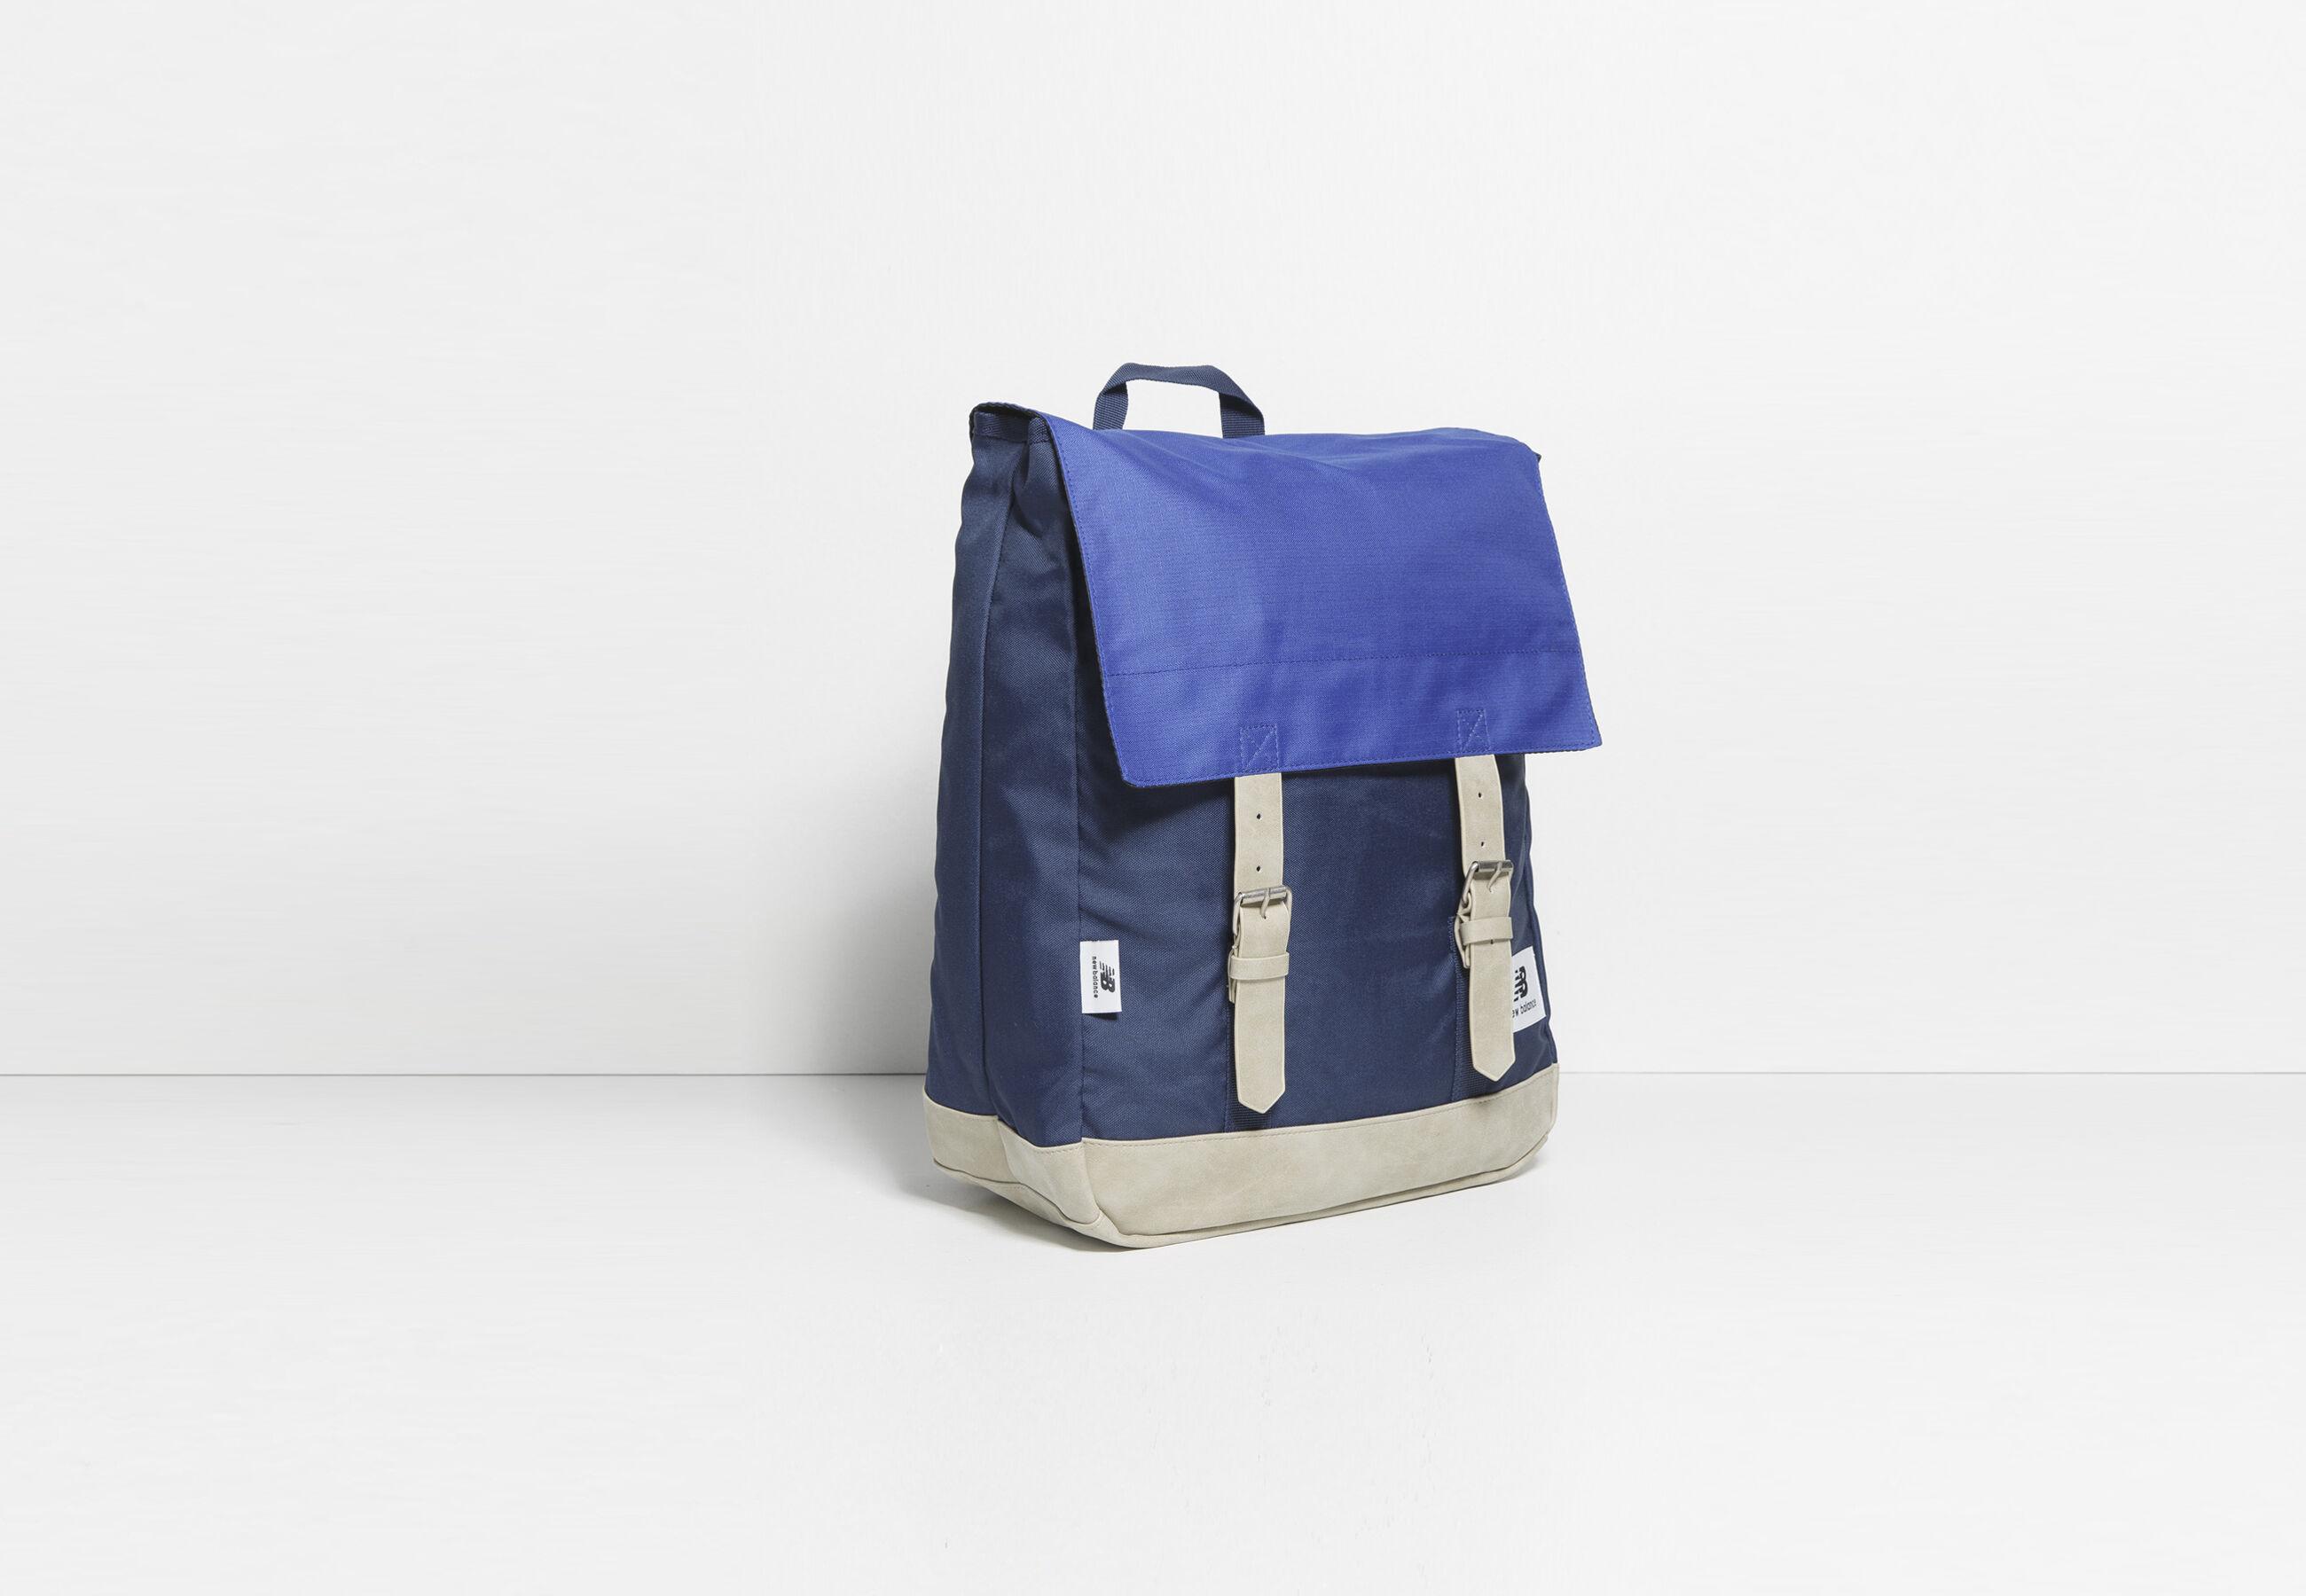 sac dos postier new balance bleu fantaisie homme jules. Black Bedroom Furniture Sets. Home Design Ideas